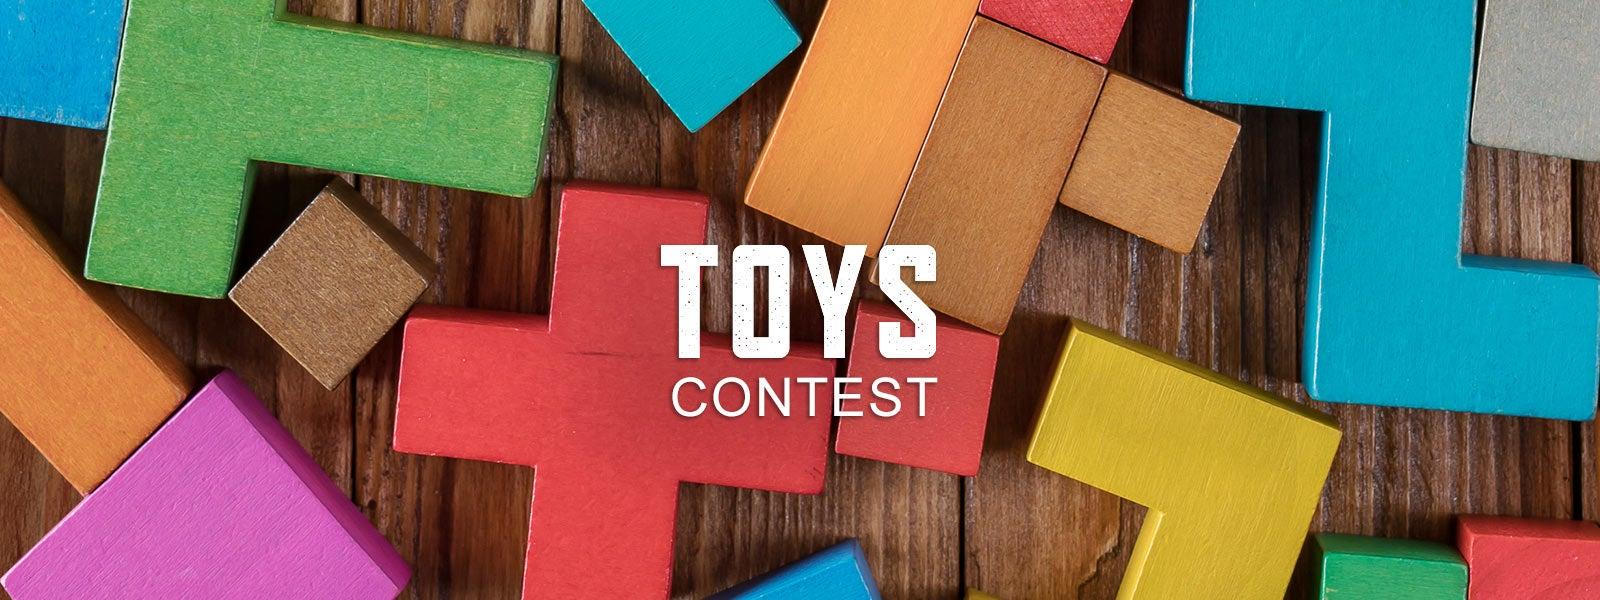 Toys Contest